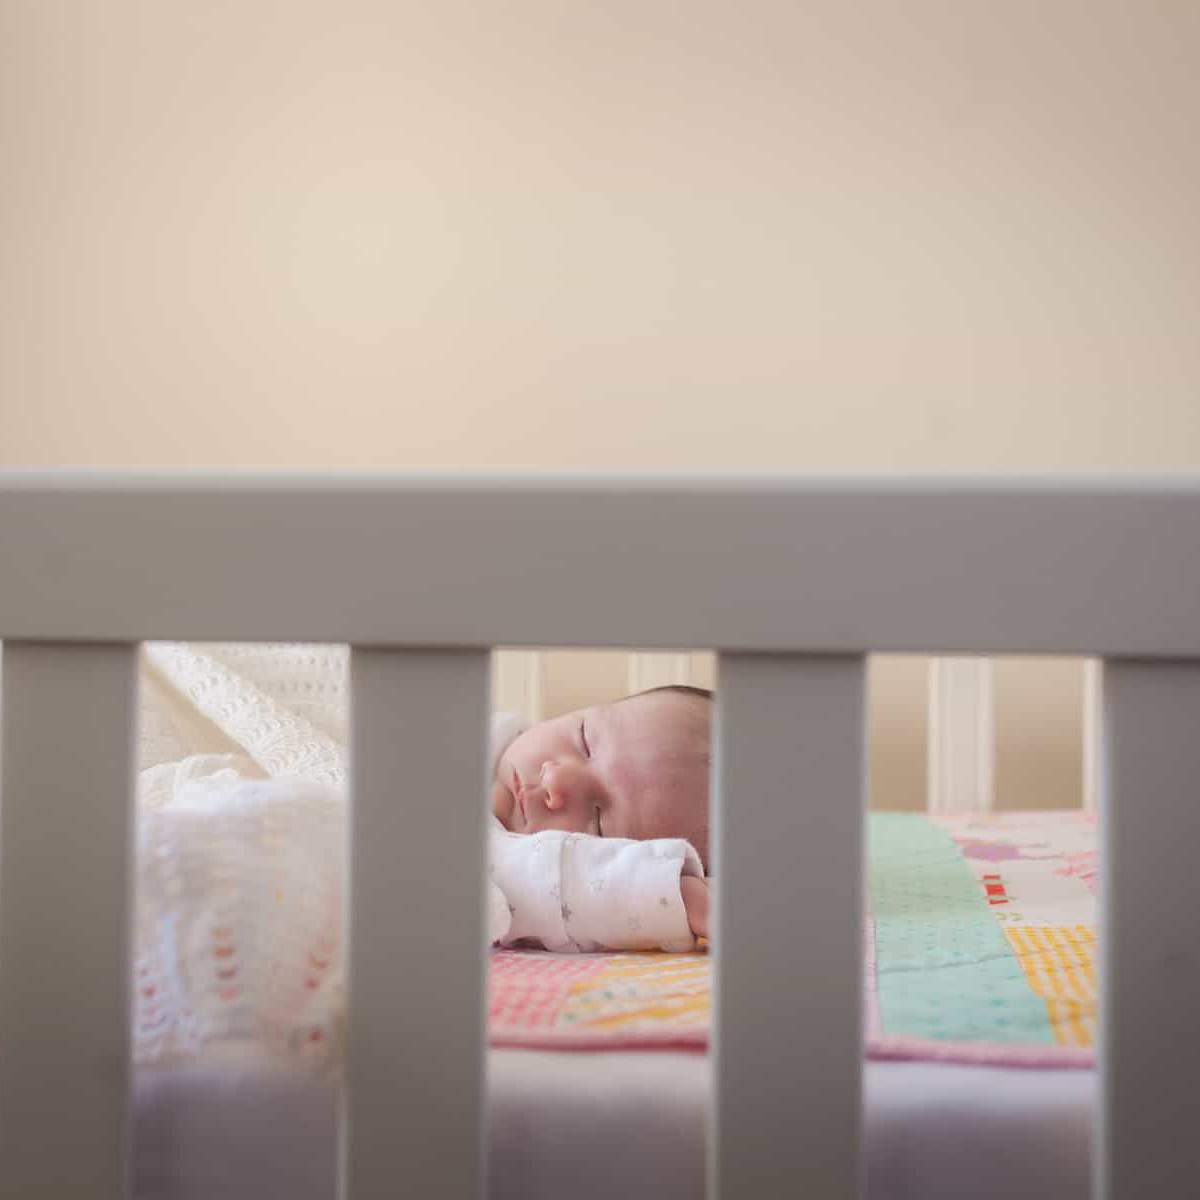 Newborn Photoshoots at home. Edinburgh and surrounding areas. 25